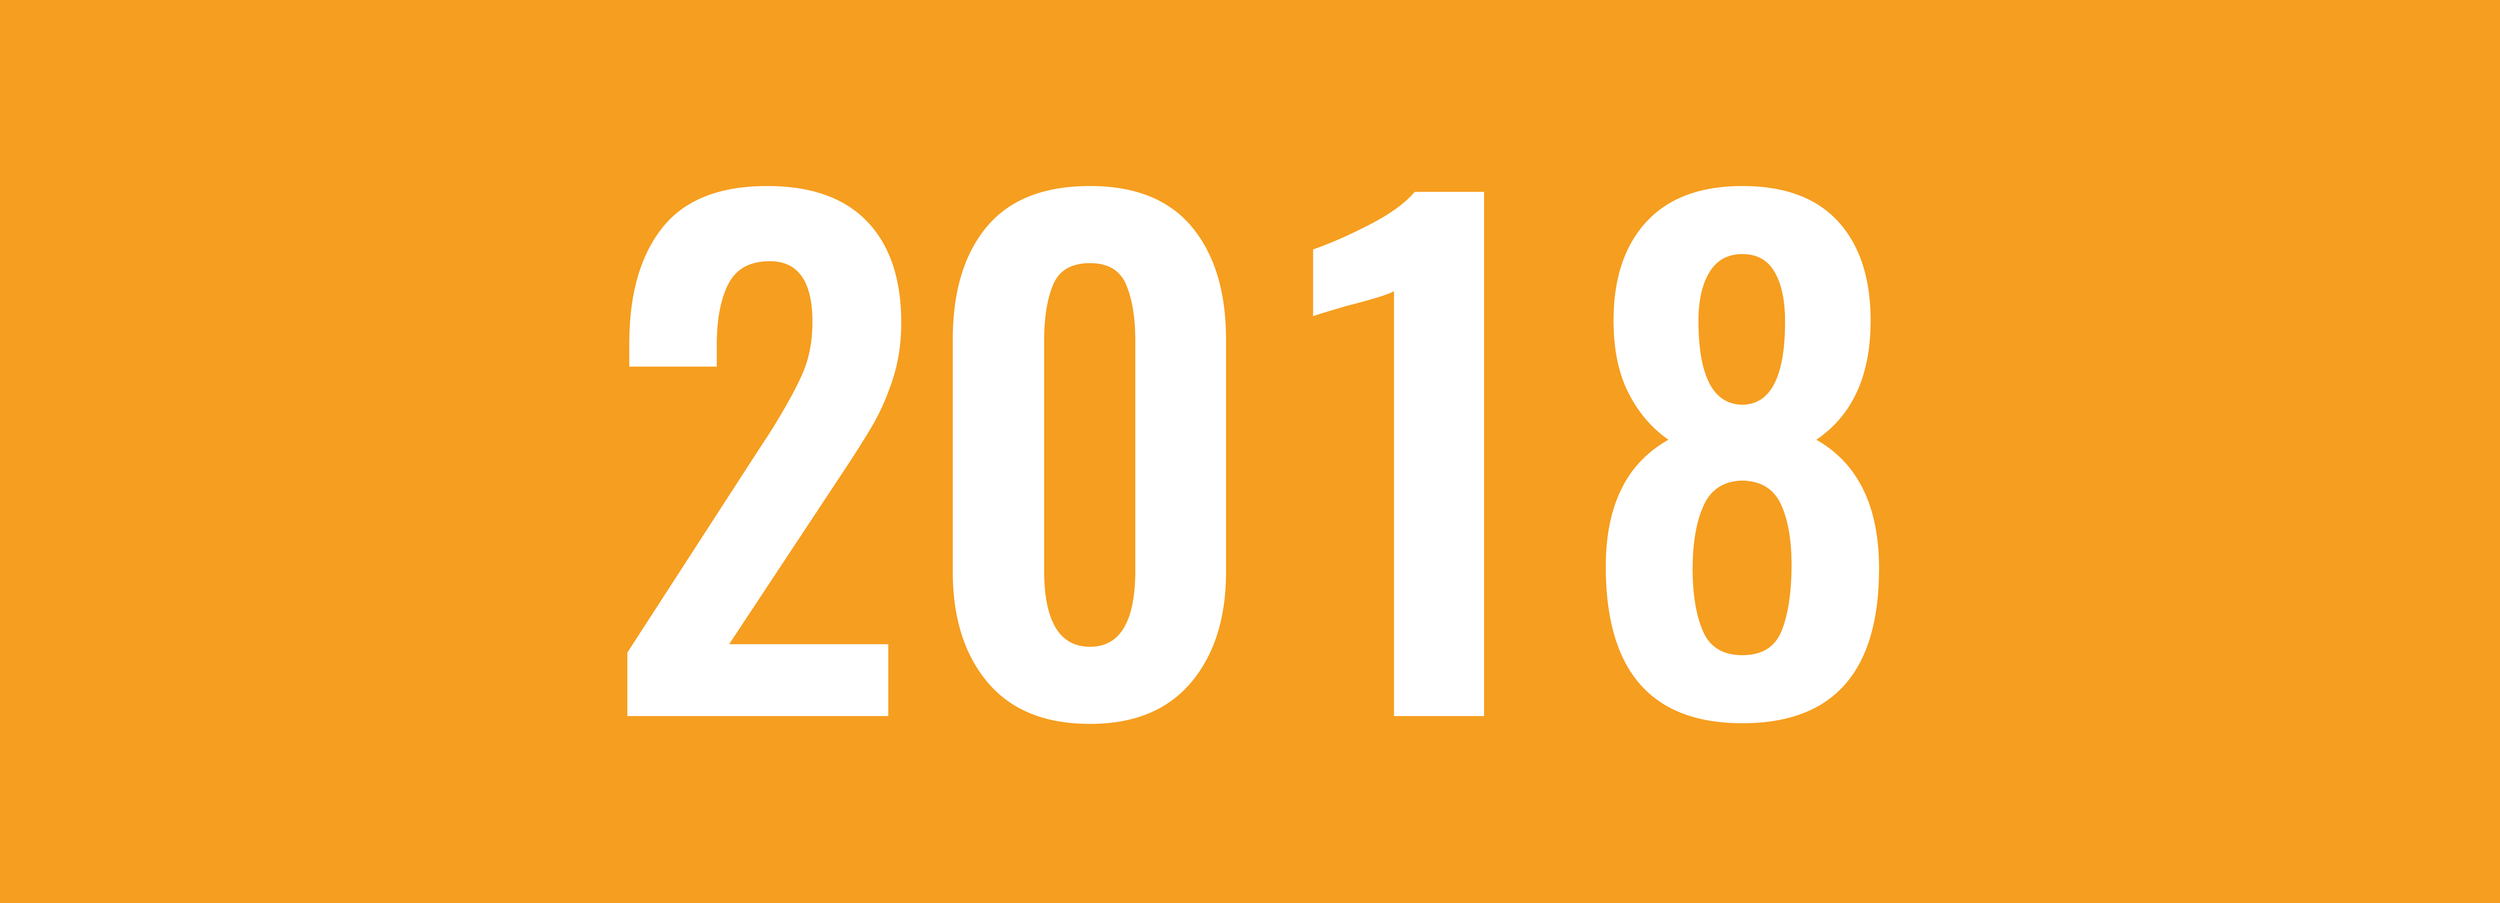 2018 Horizontal Banner-01.png